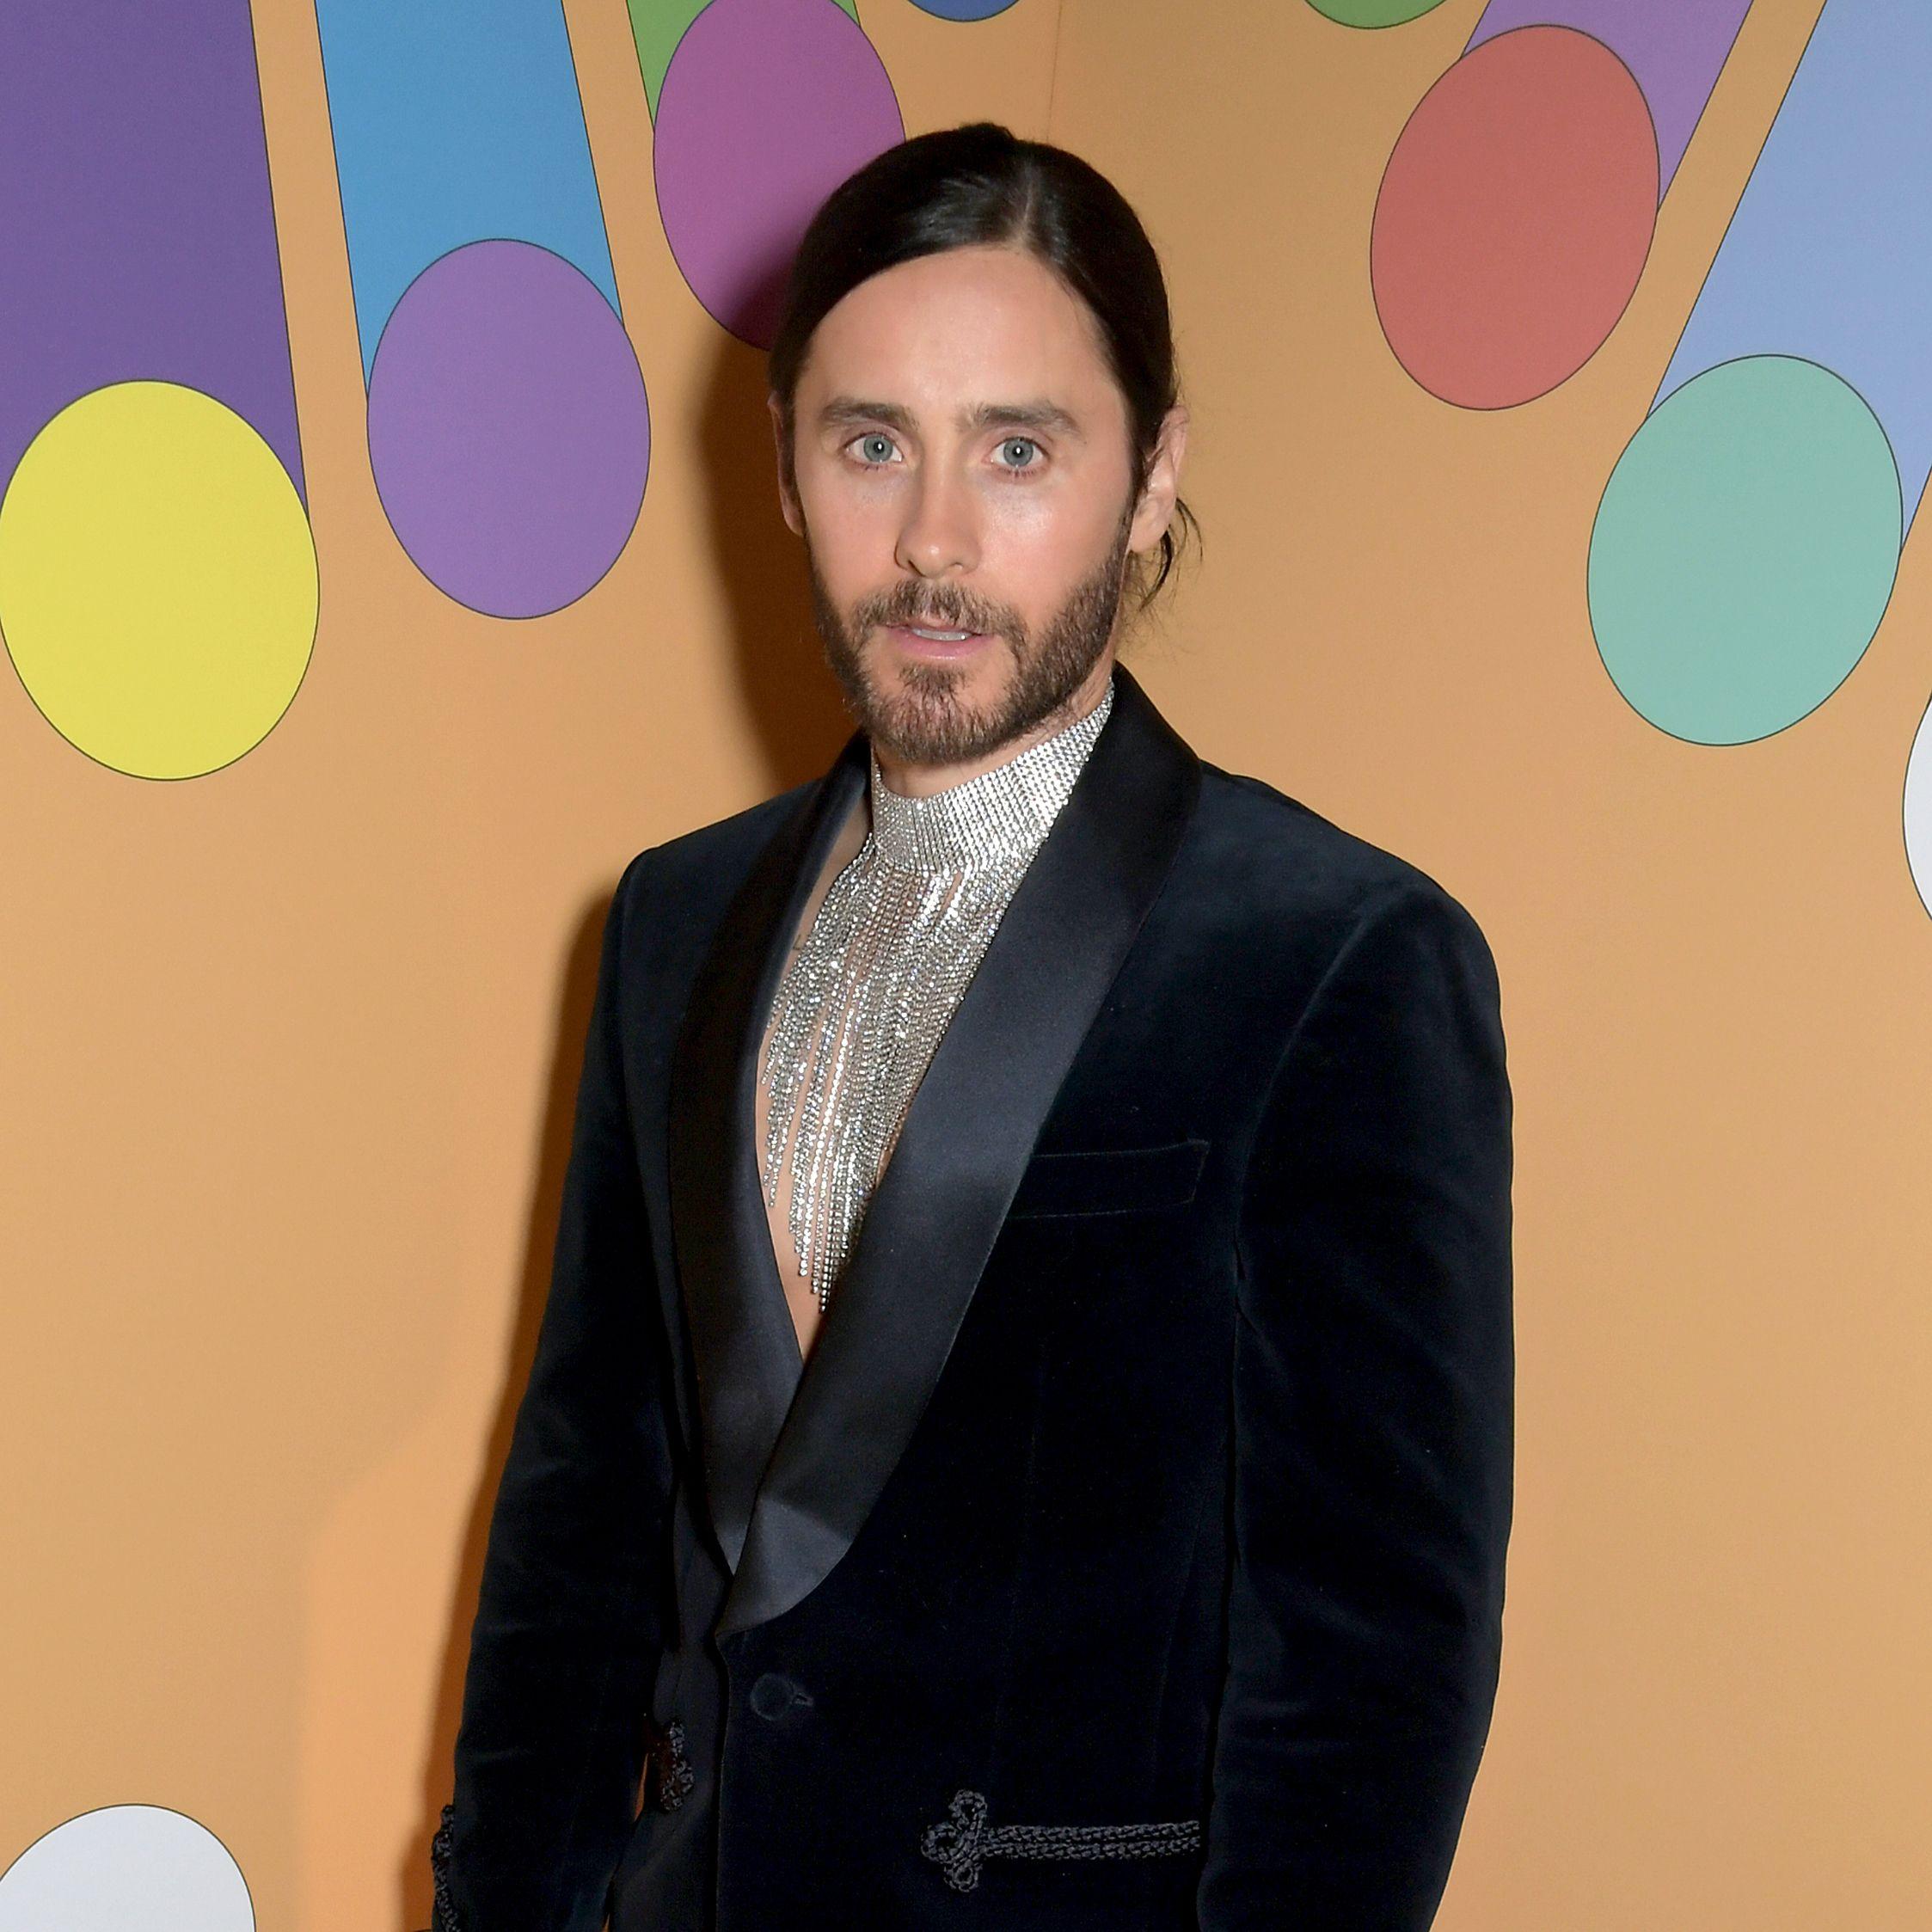 Jared Leto's Brit Awards Aesthetic Was 'Disco Emperor'